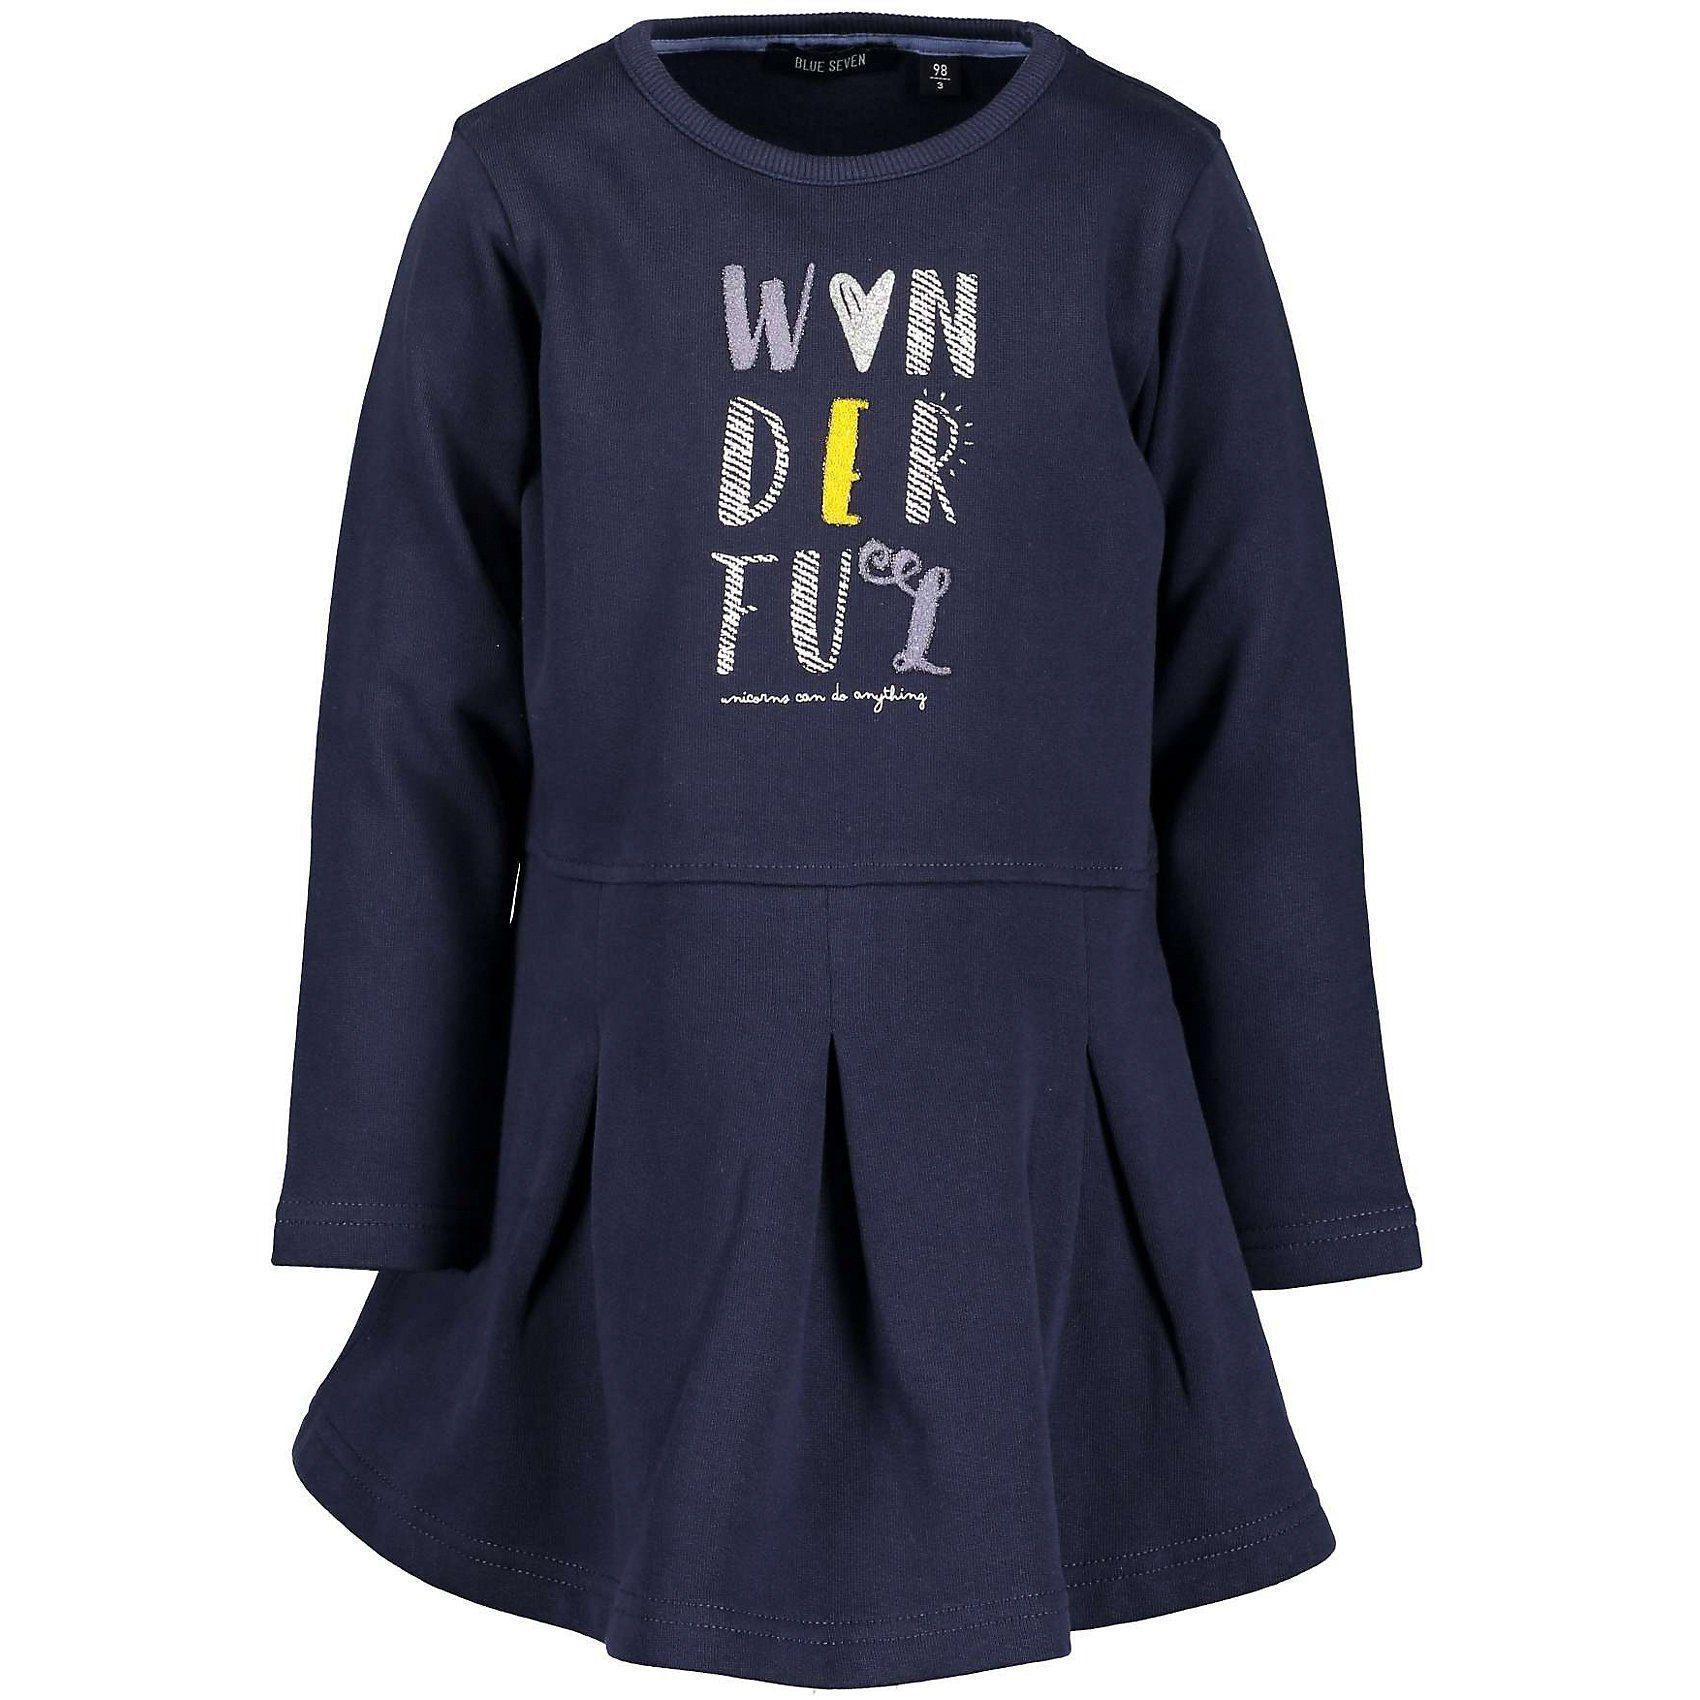 Blue Seven Kinder Sweatkleid